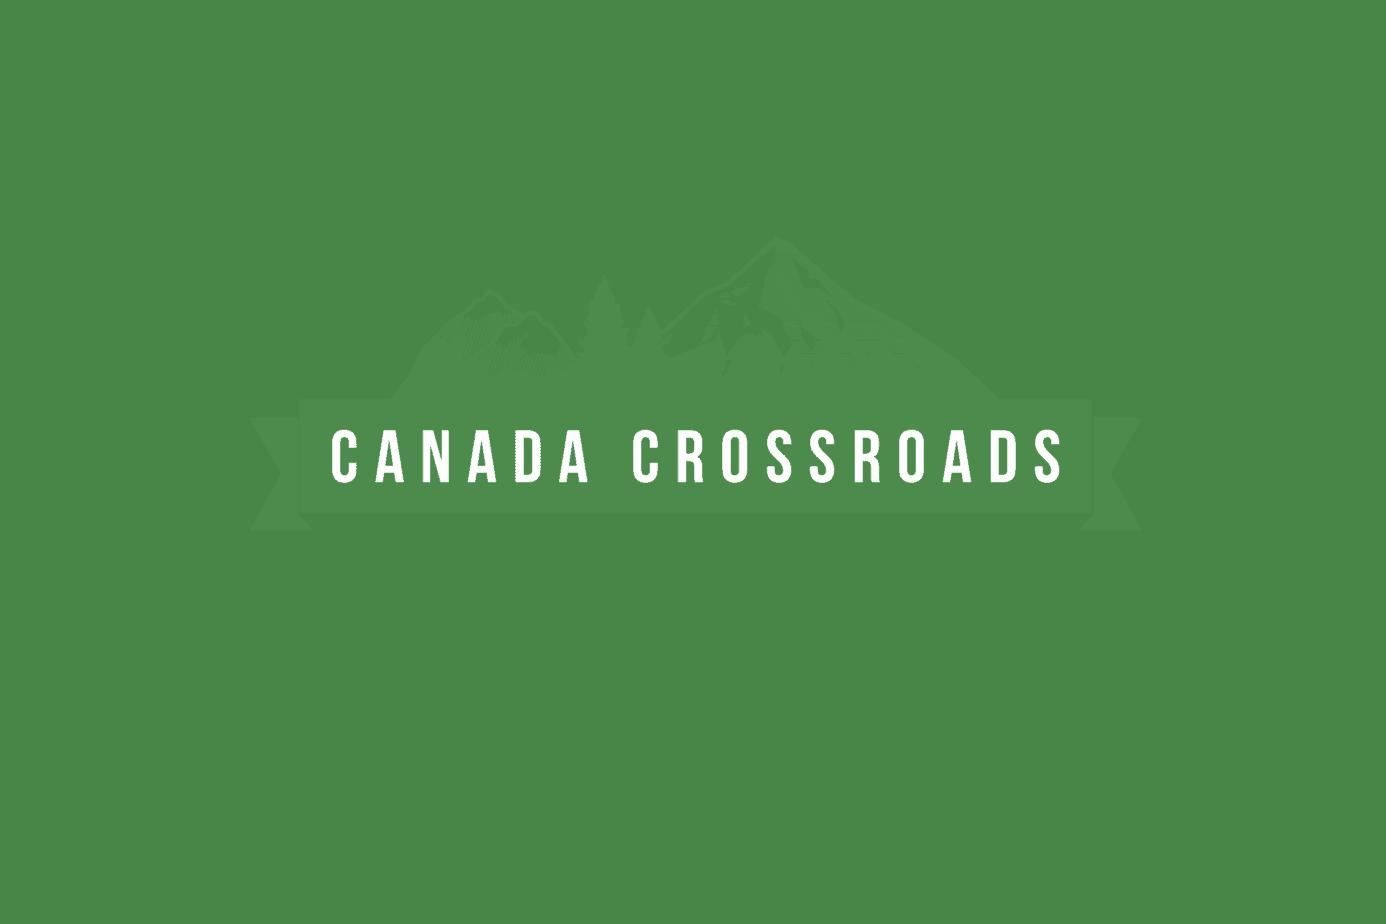 Canada Crossroads